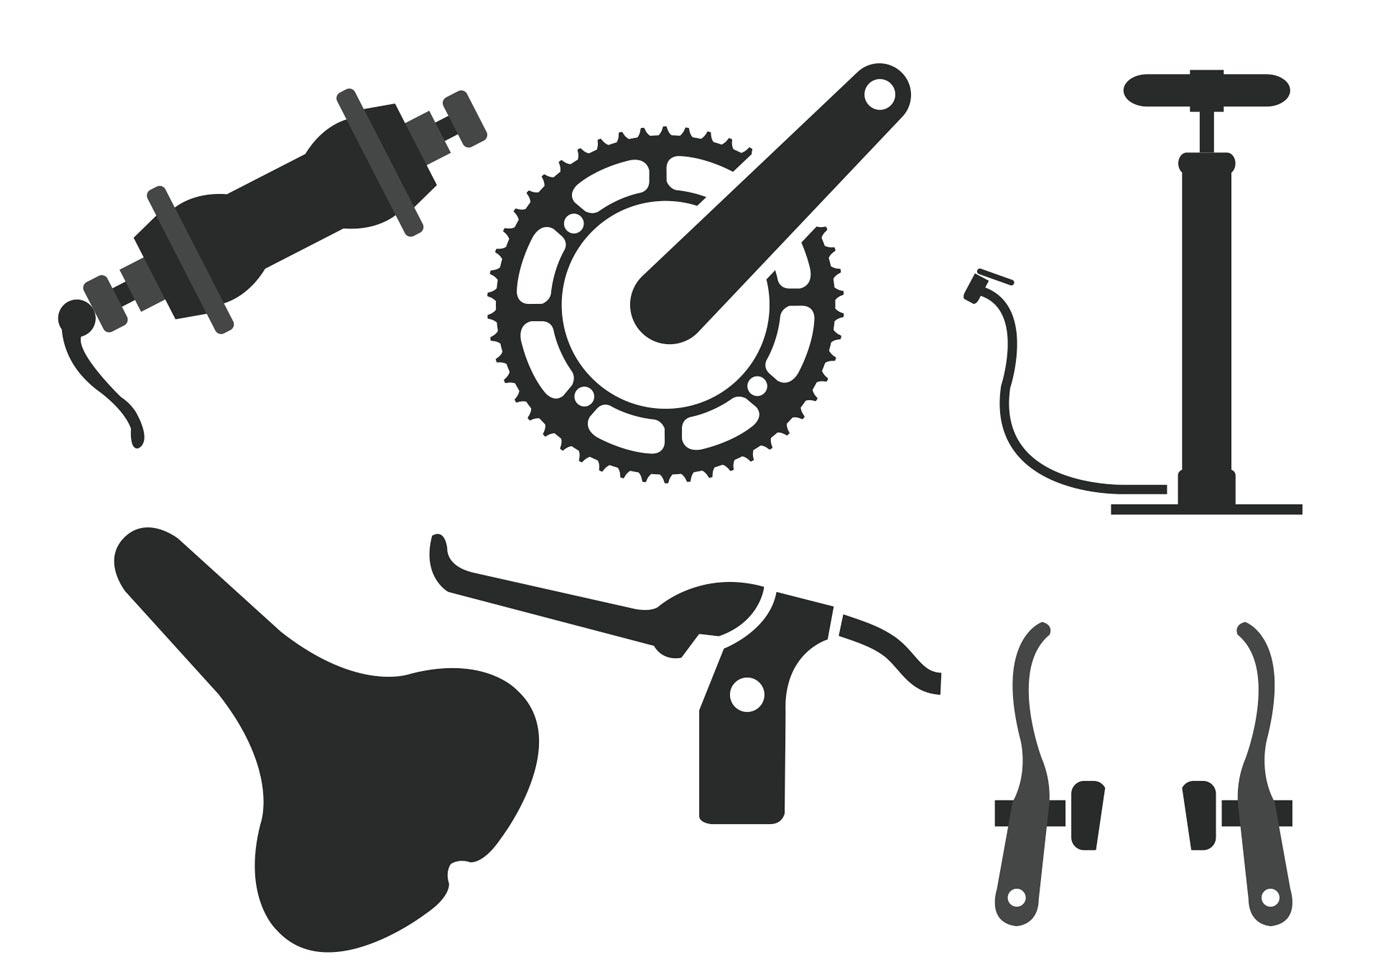 Bicycle Gear Parts